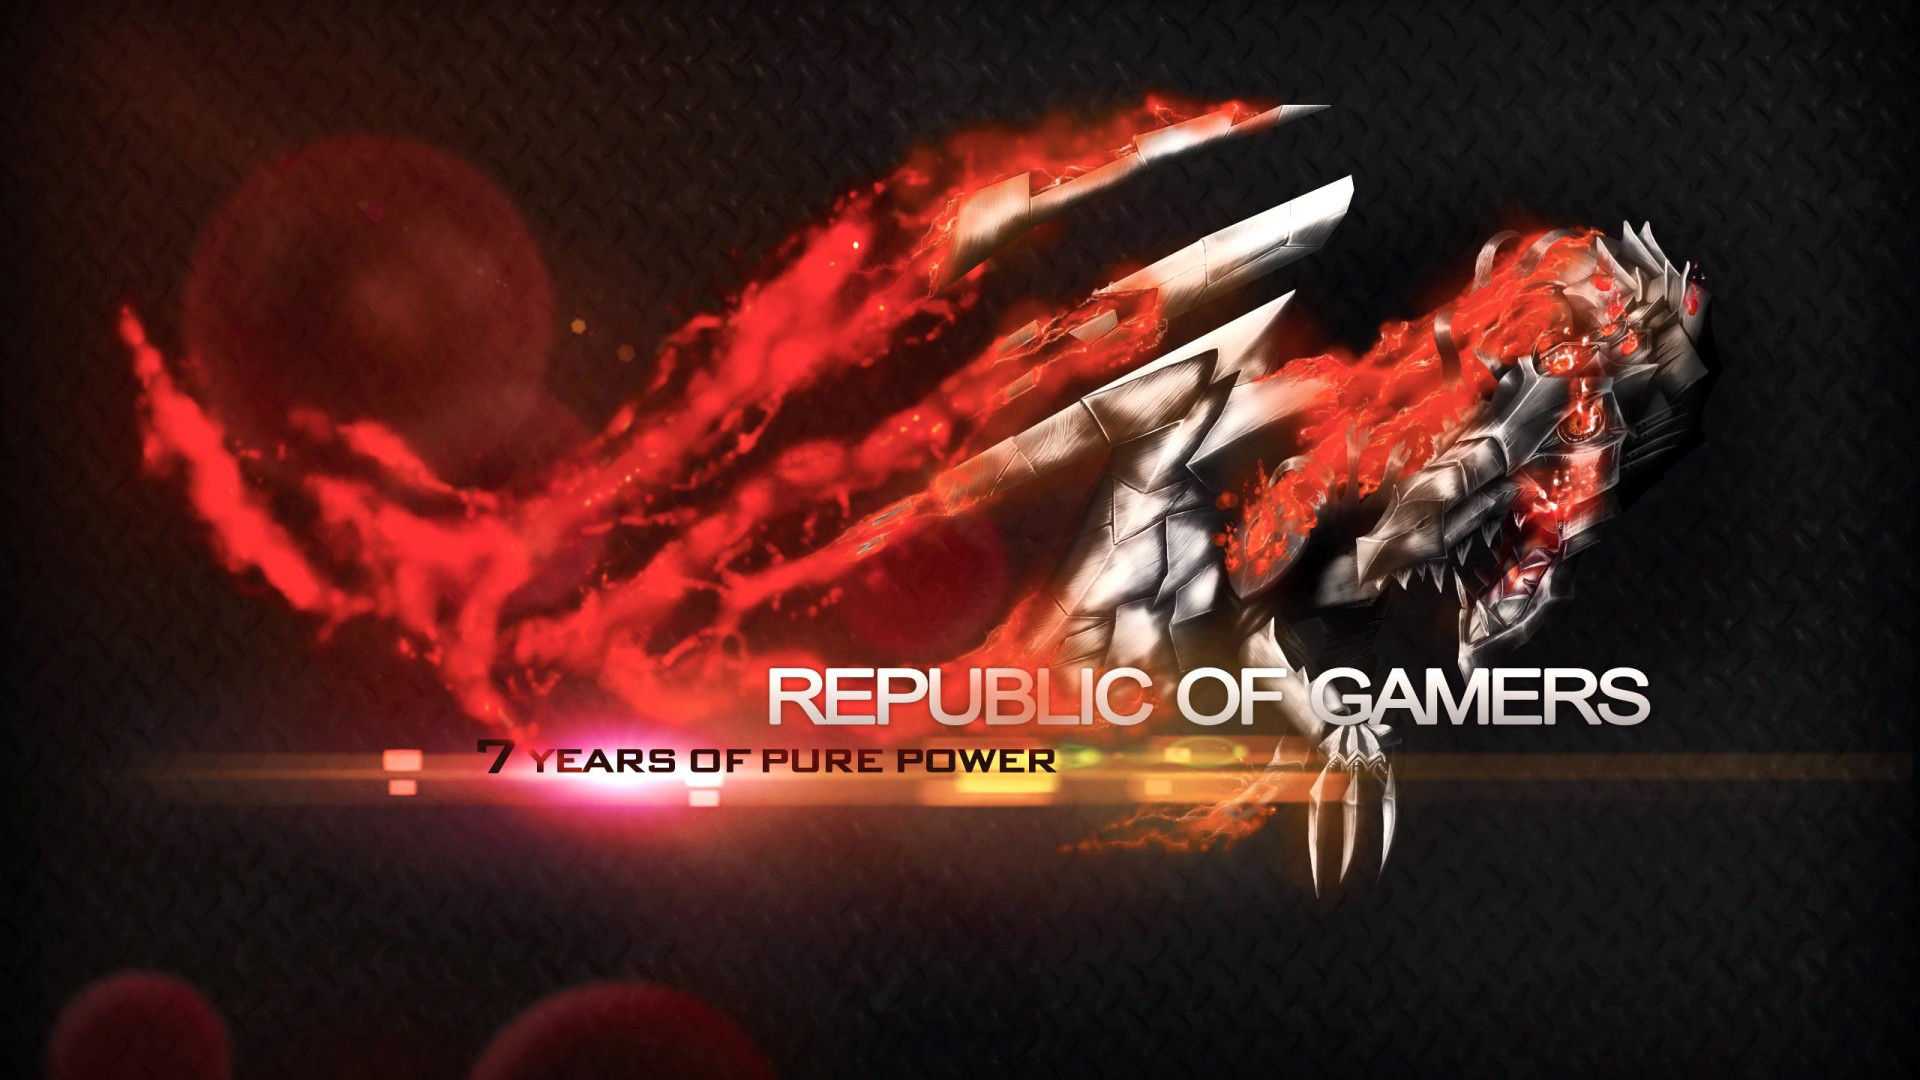 asus rog republic of gamers flaming metal dragon logo hd 1920x1080 1920x1080